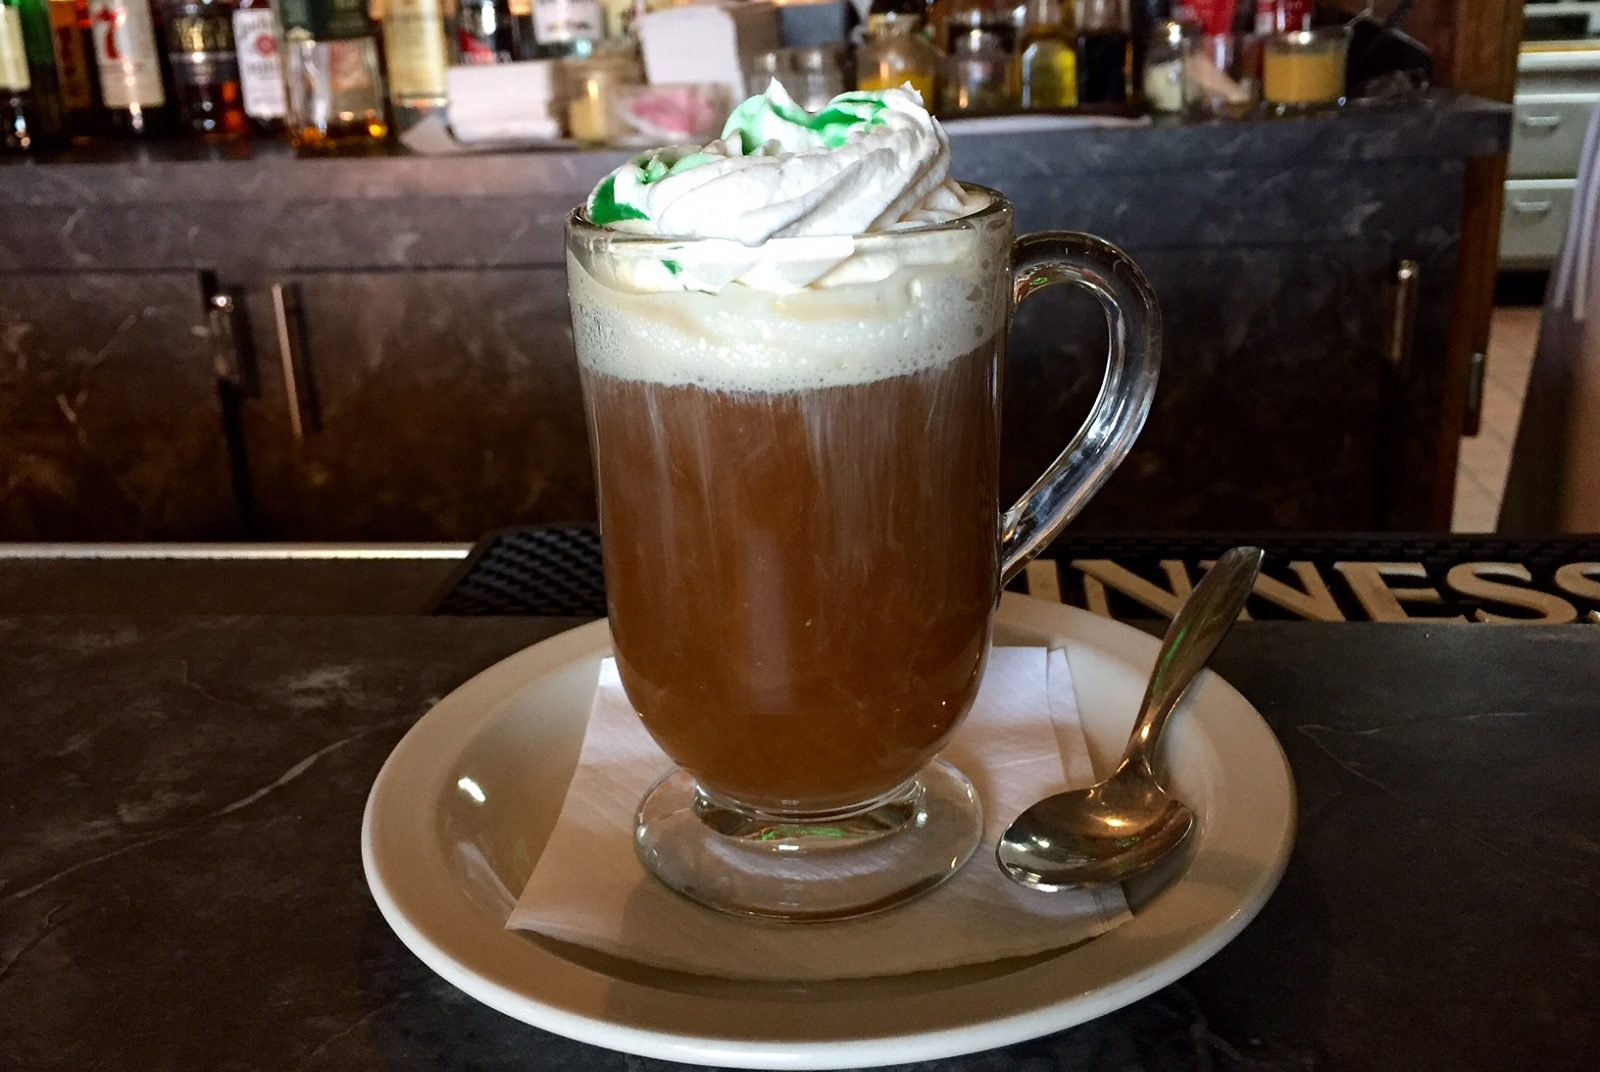 An Irish coffee, McPartlan's way with green creme de menthe on top. (Elizabeth Carey/Special to The News)